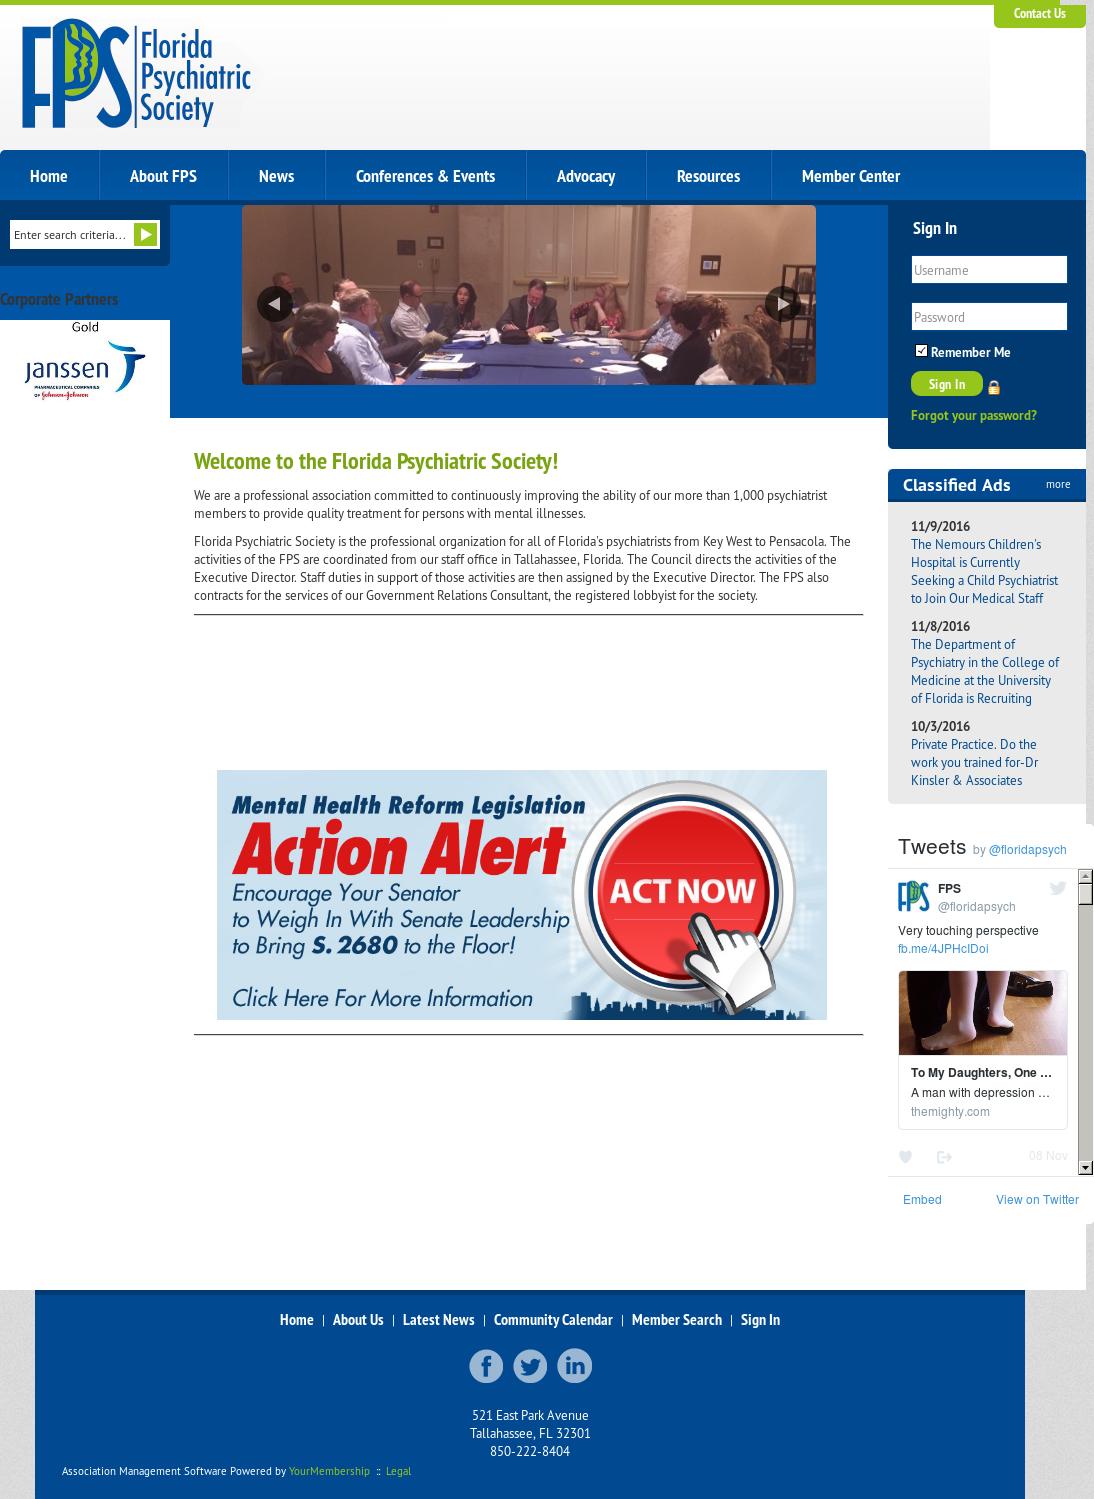 Florida Psychiatric Society Competitors, Revenue and